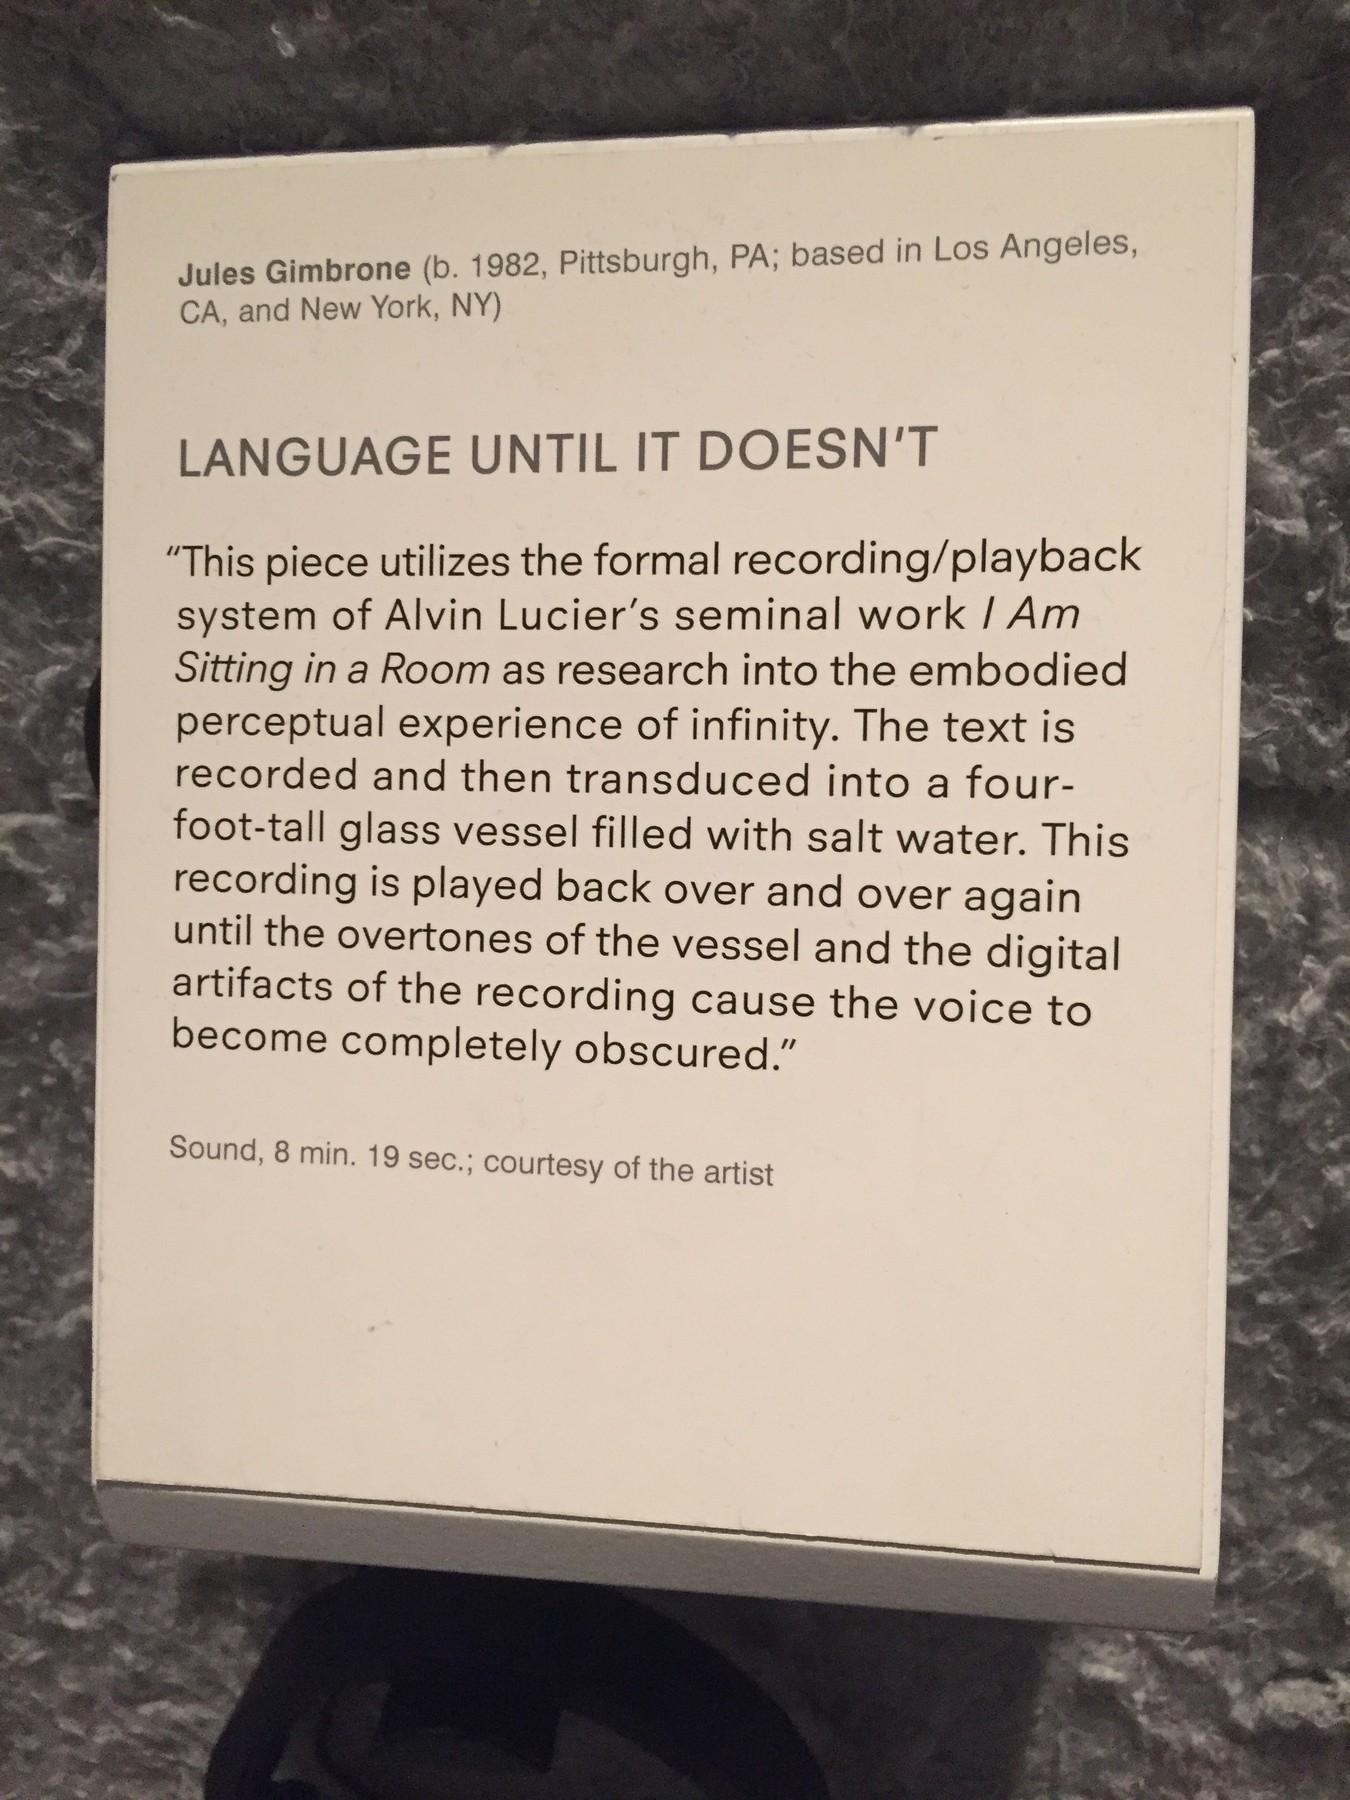 languageuntilitdoesnt.jpg